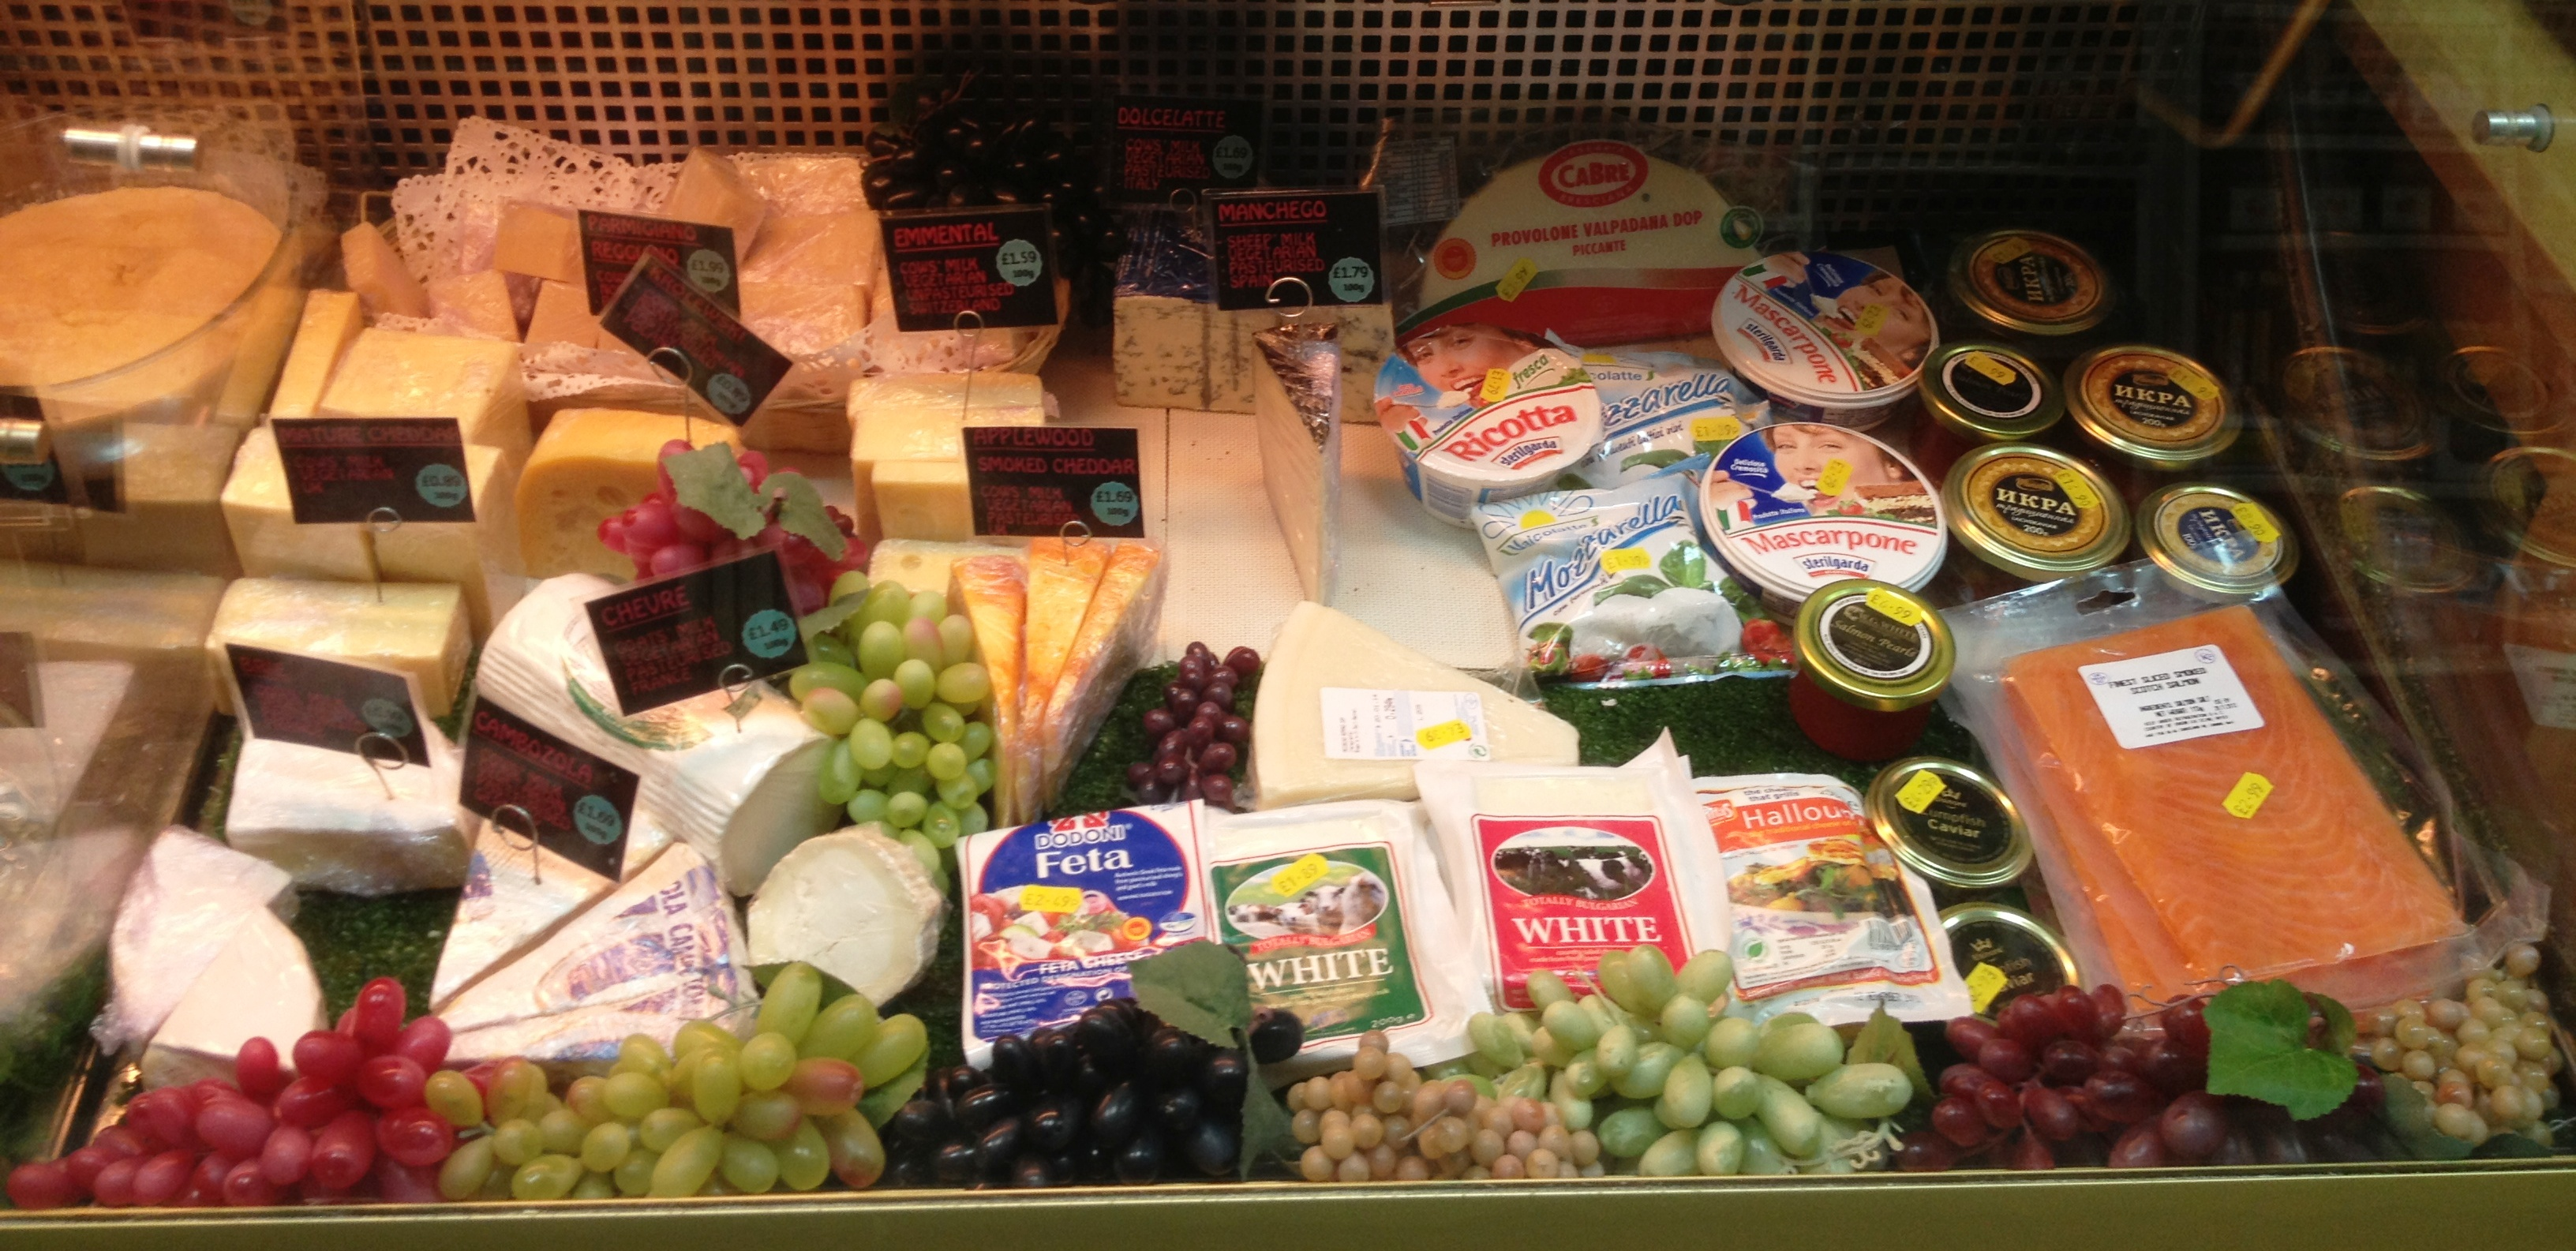 Malinka cheeses - kenningtonrunoff.com